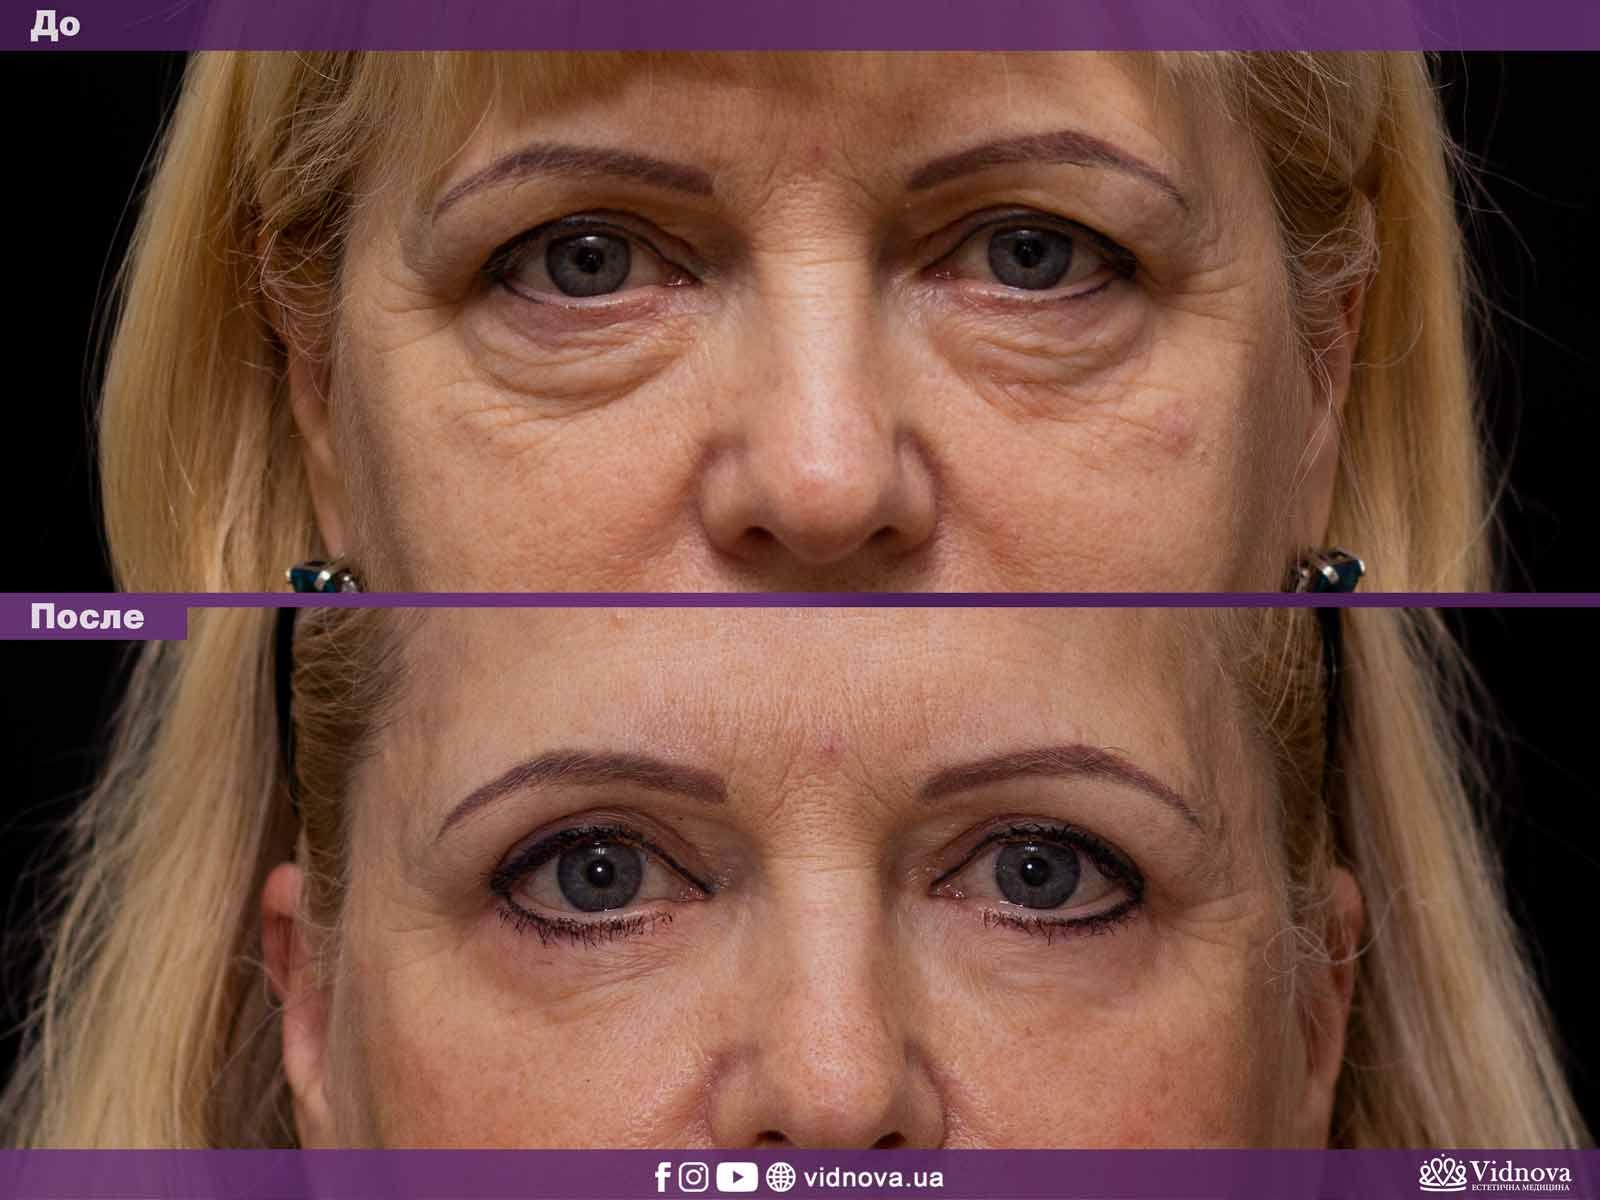 Блефаропластика: Фото До и После - Пример №1-1 - Клиника Vidnova